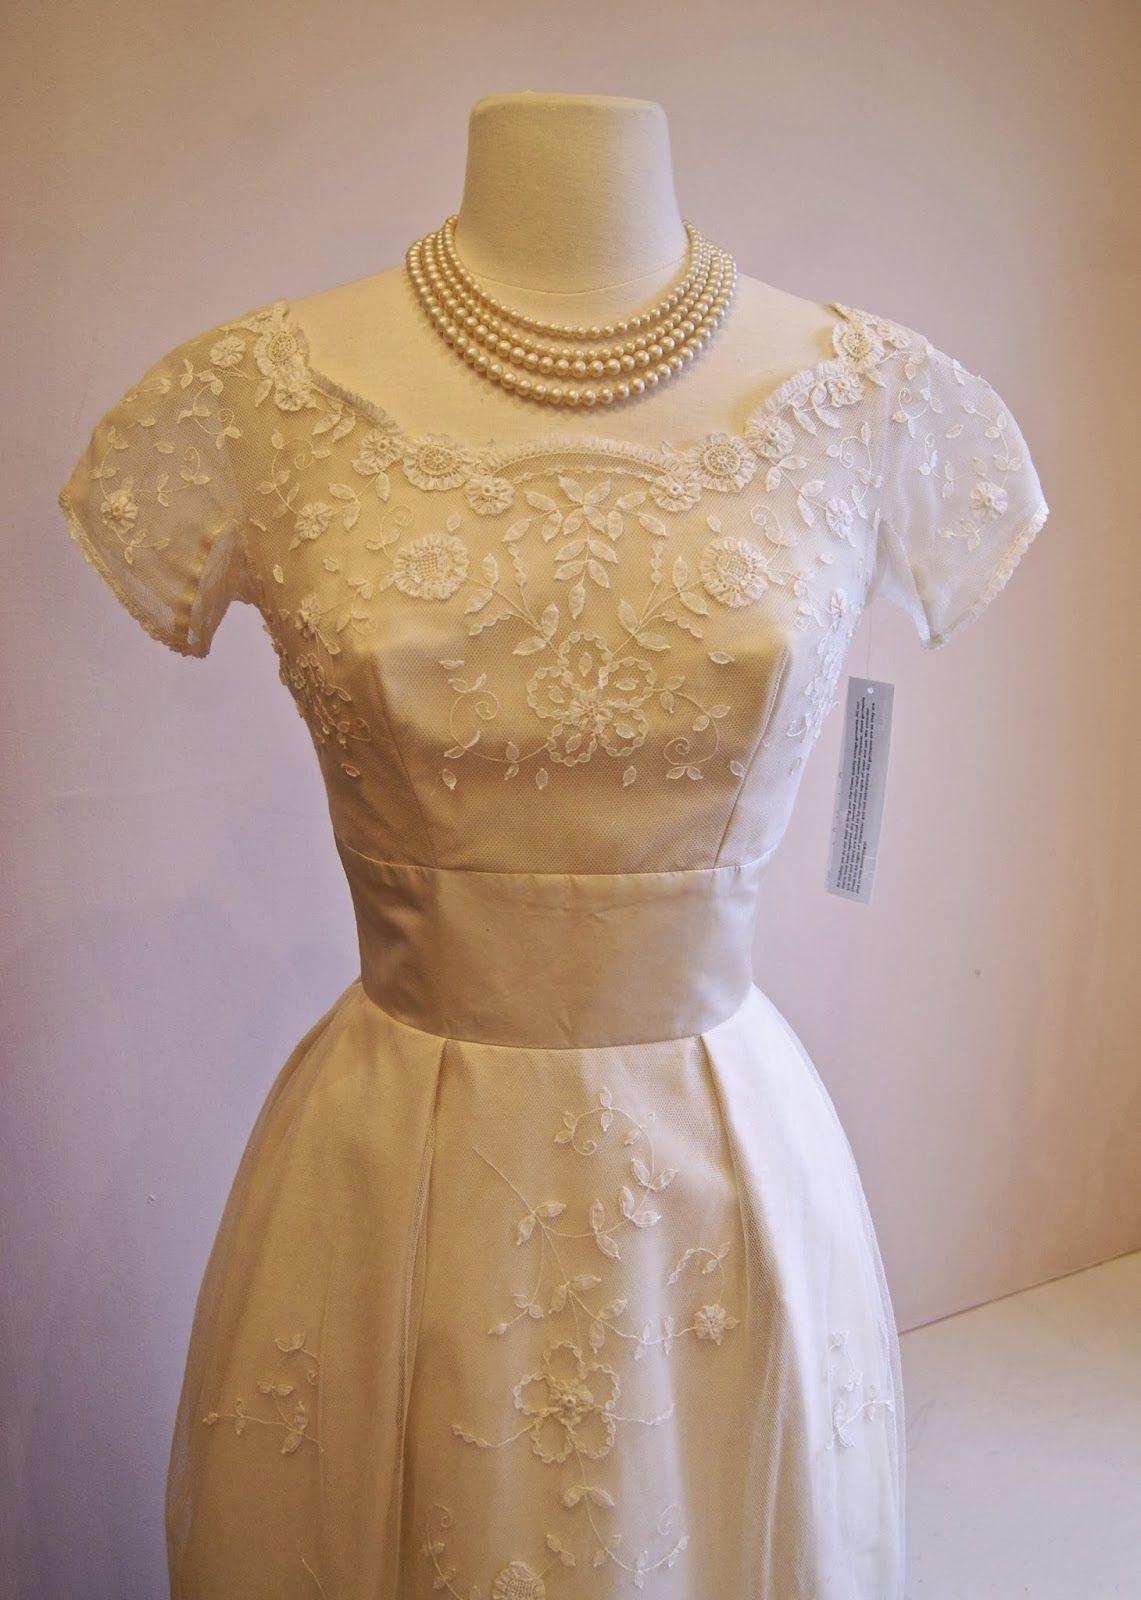 Xtabay vintage clothing boutique portland oregon january 2014 xtabay vintage clothing boutique portland oregon january 2014 ombrellifo Gallery